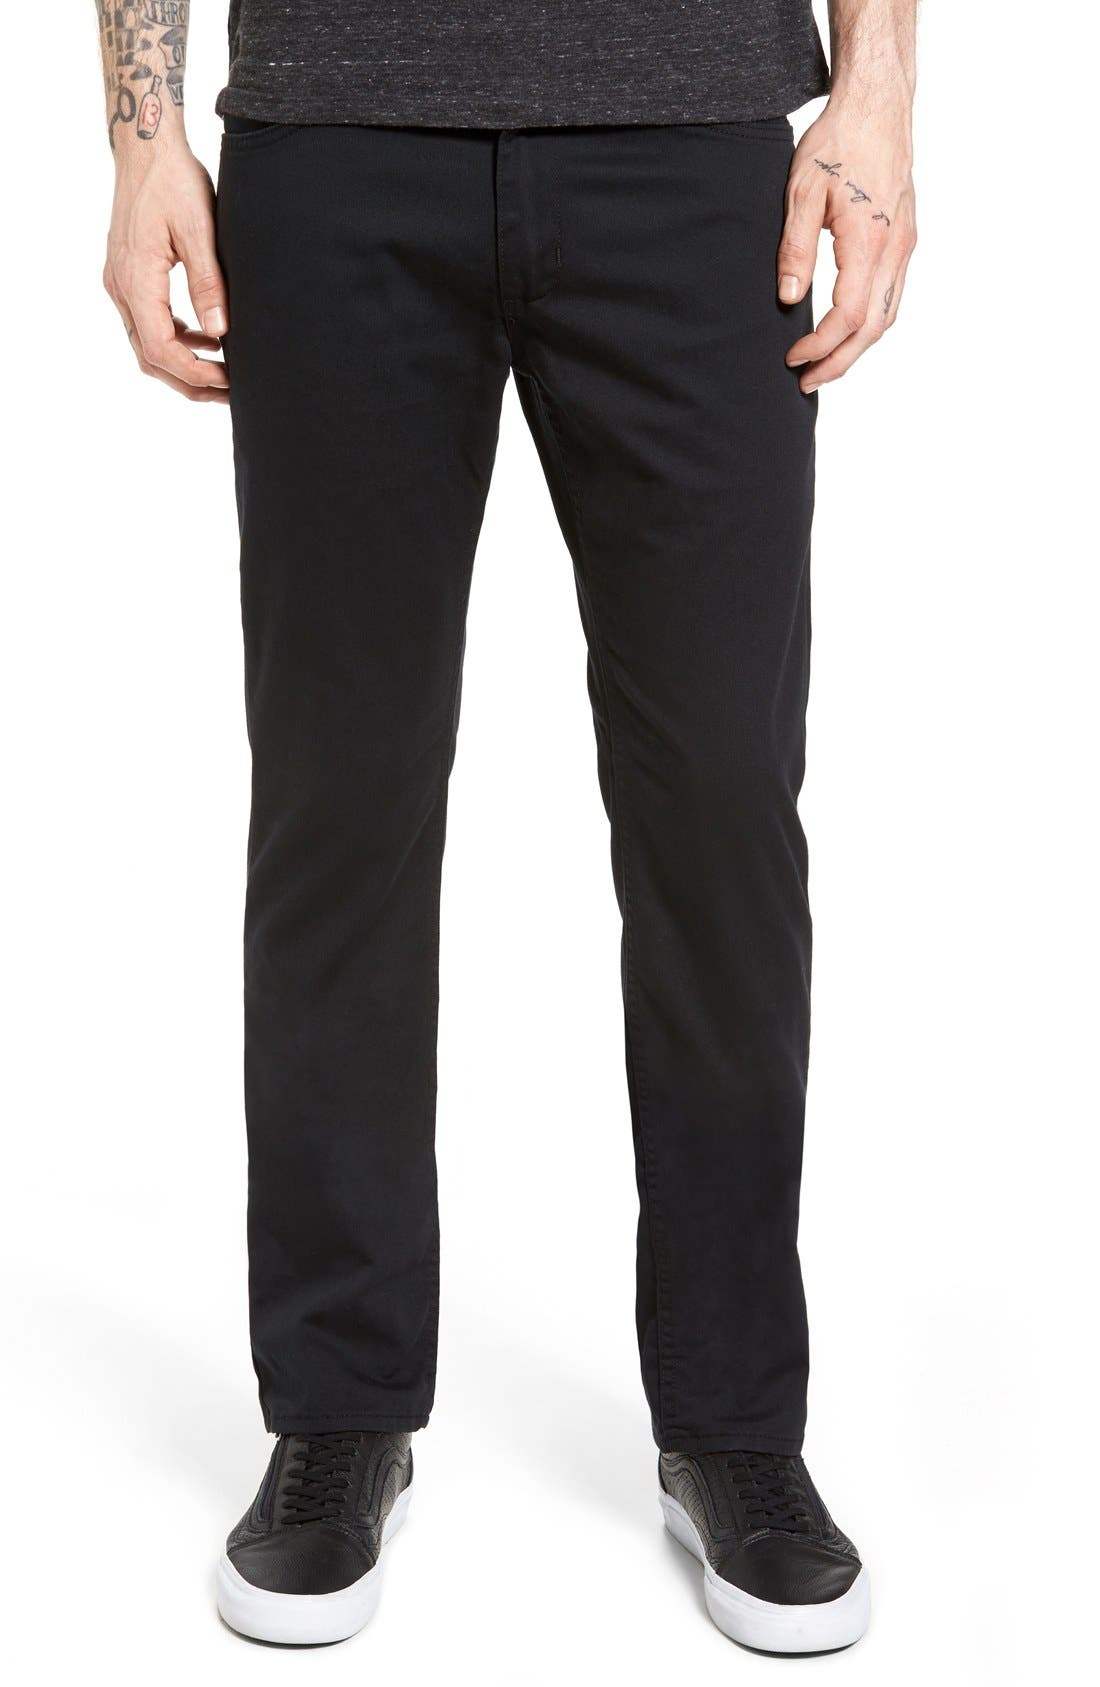 V56 Covina II Slim Fit Pants,                             Main thumbnail 1, color,                             001